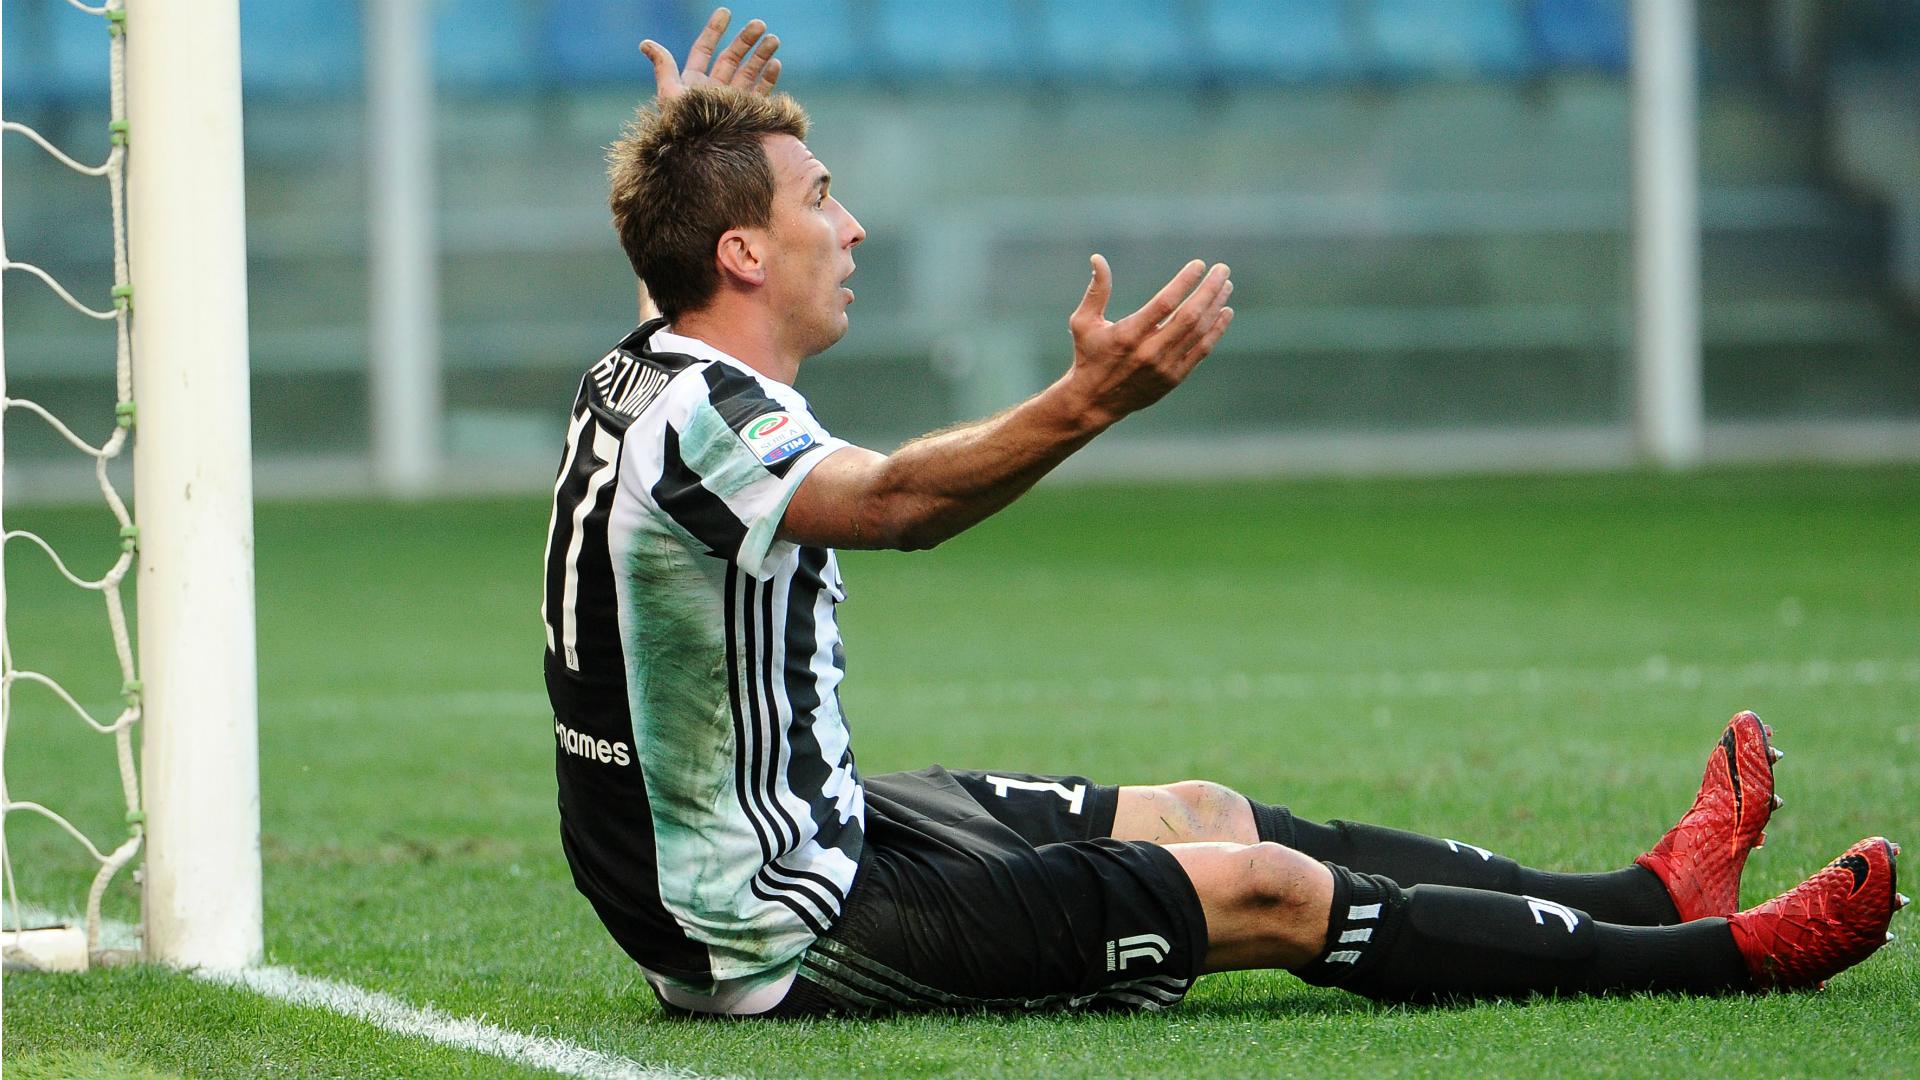 Napoli-Juve, i convocati bianconeri: ko Mandzukic e Howedes